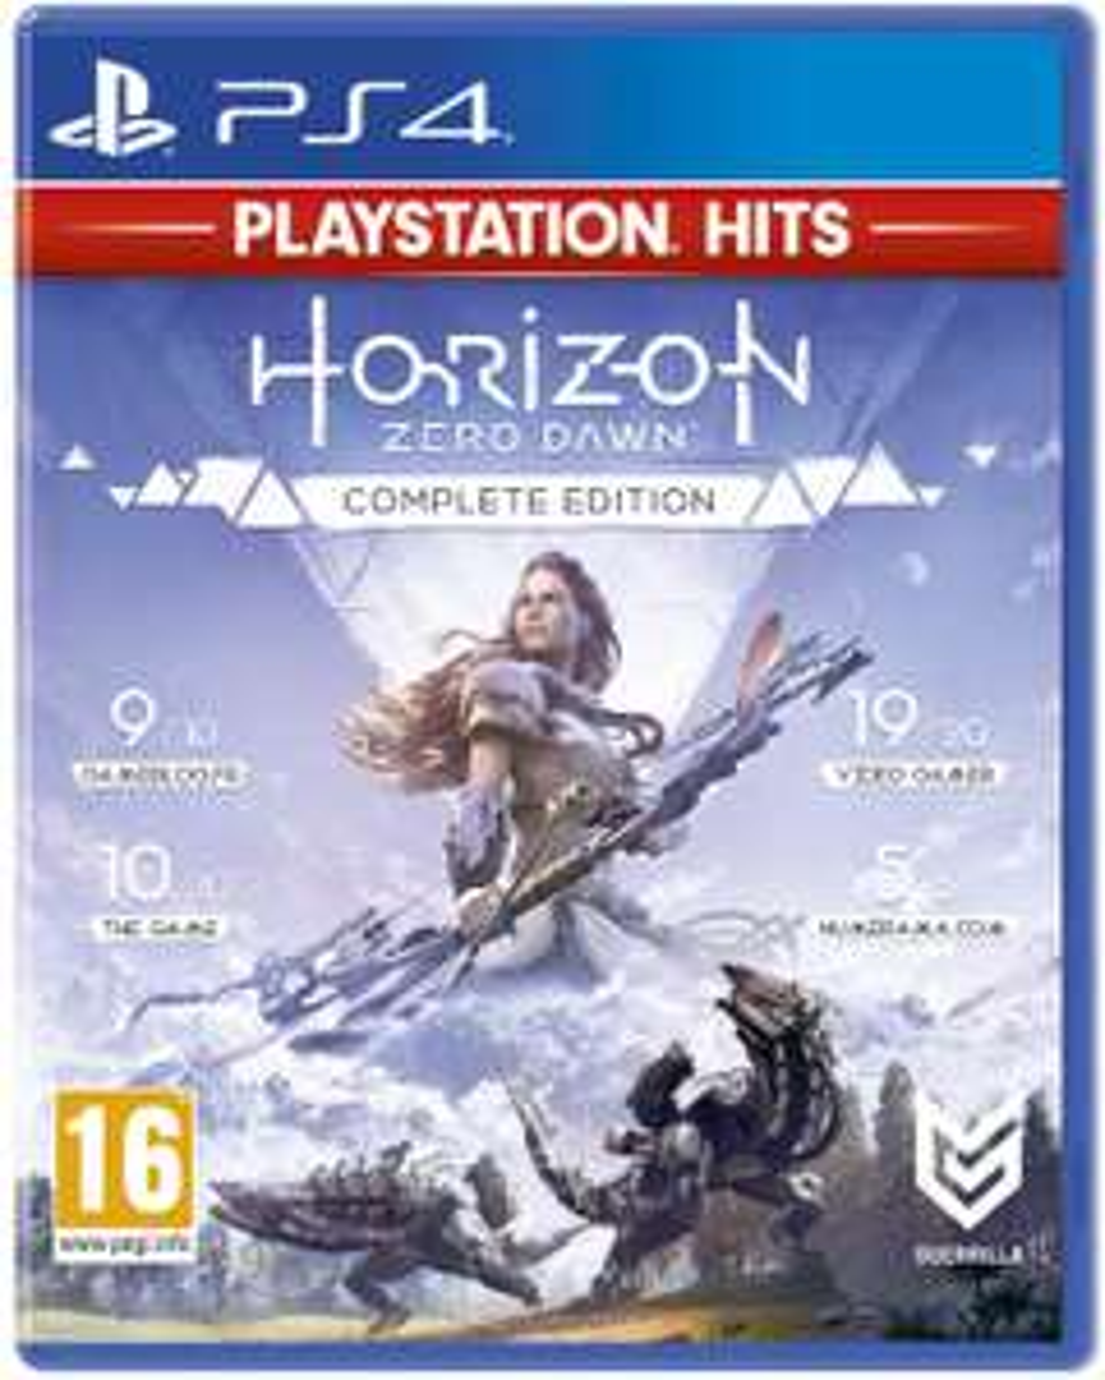 Horizon Zero Dawn - Complete Edition sur PS4 (VOSTFR)